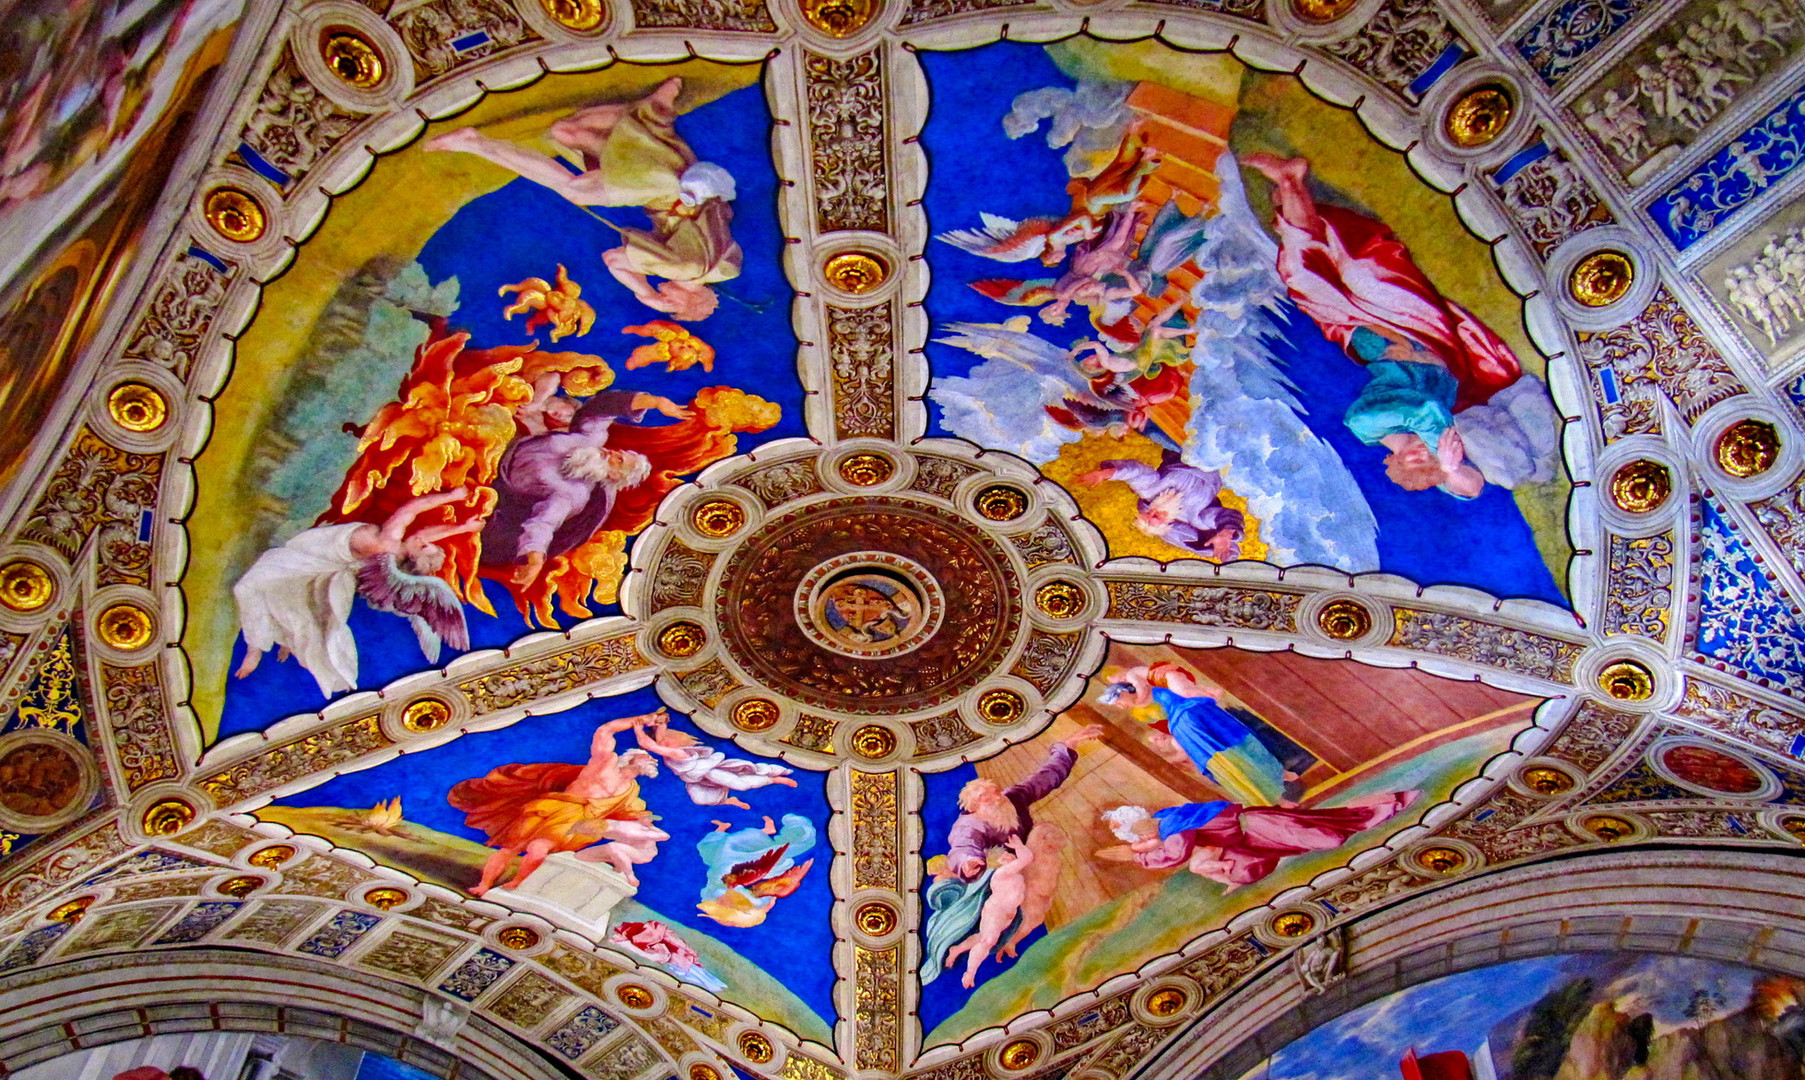 Апартаменты Борджиа в музеях Ватикана